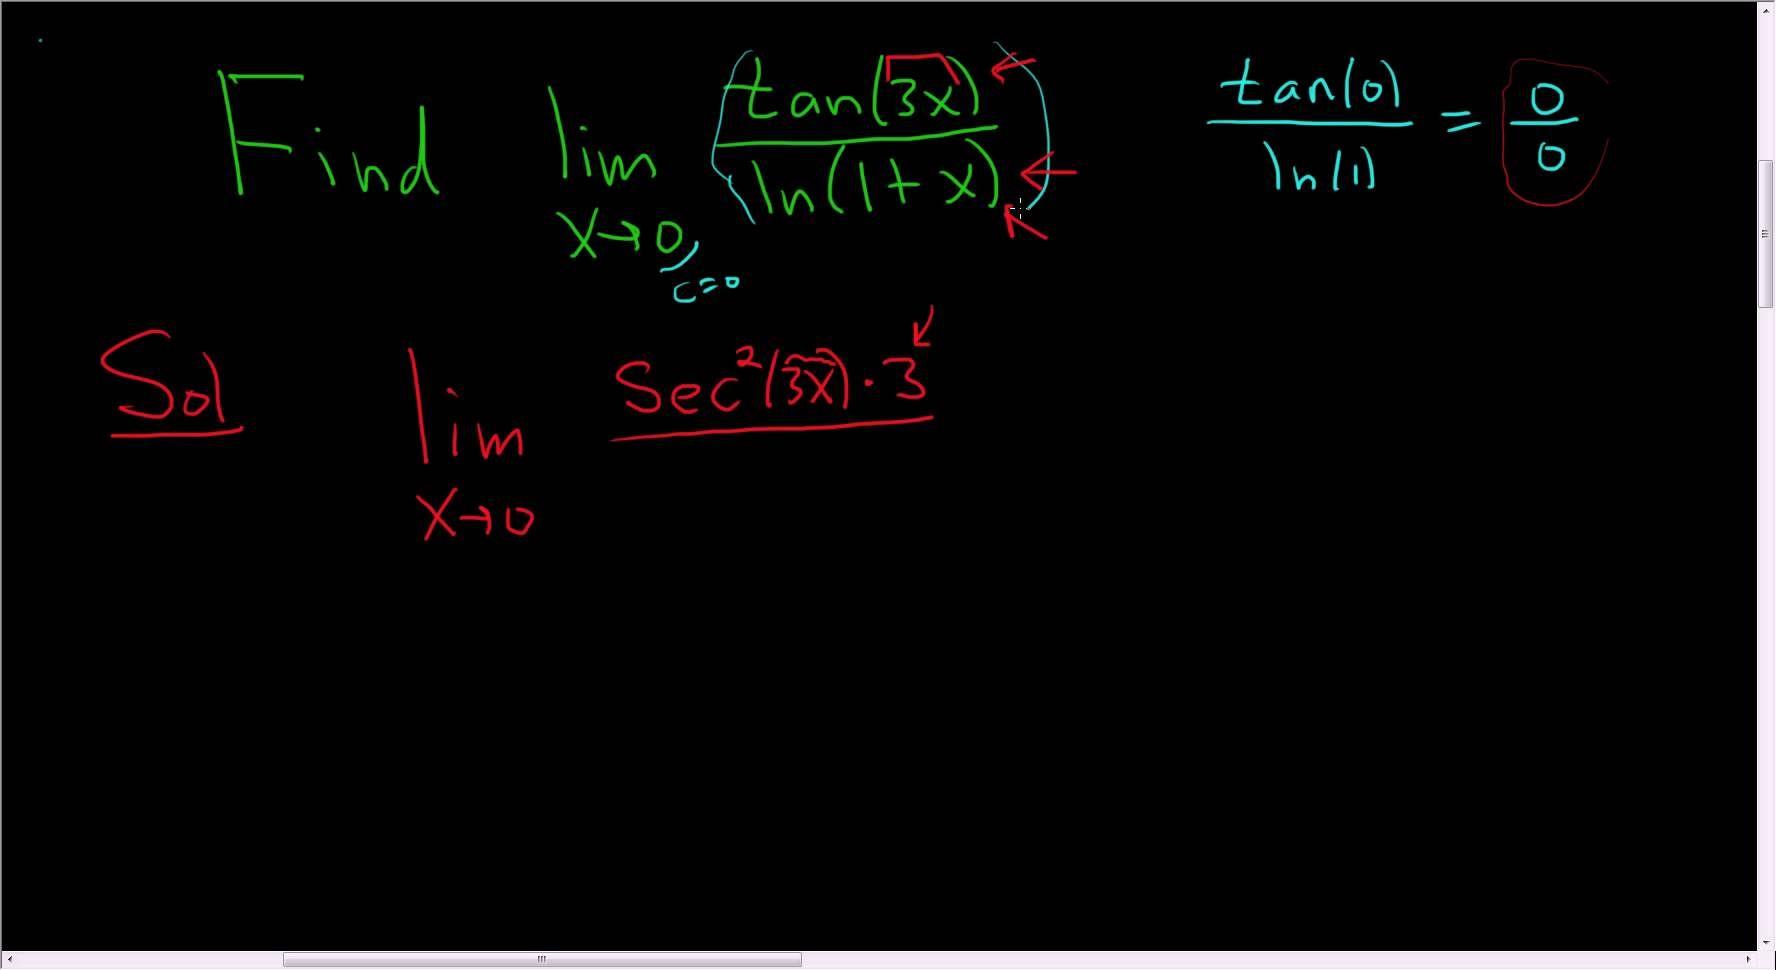 Finding The Limit Using L Hopital S Rule Tan 3x Ln 1 X As X Approach Math Videos Maths Exam Calculus